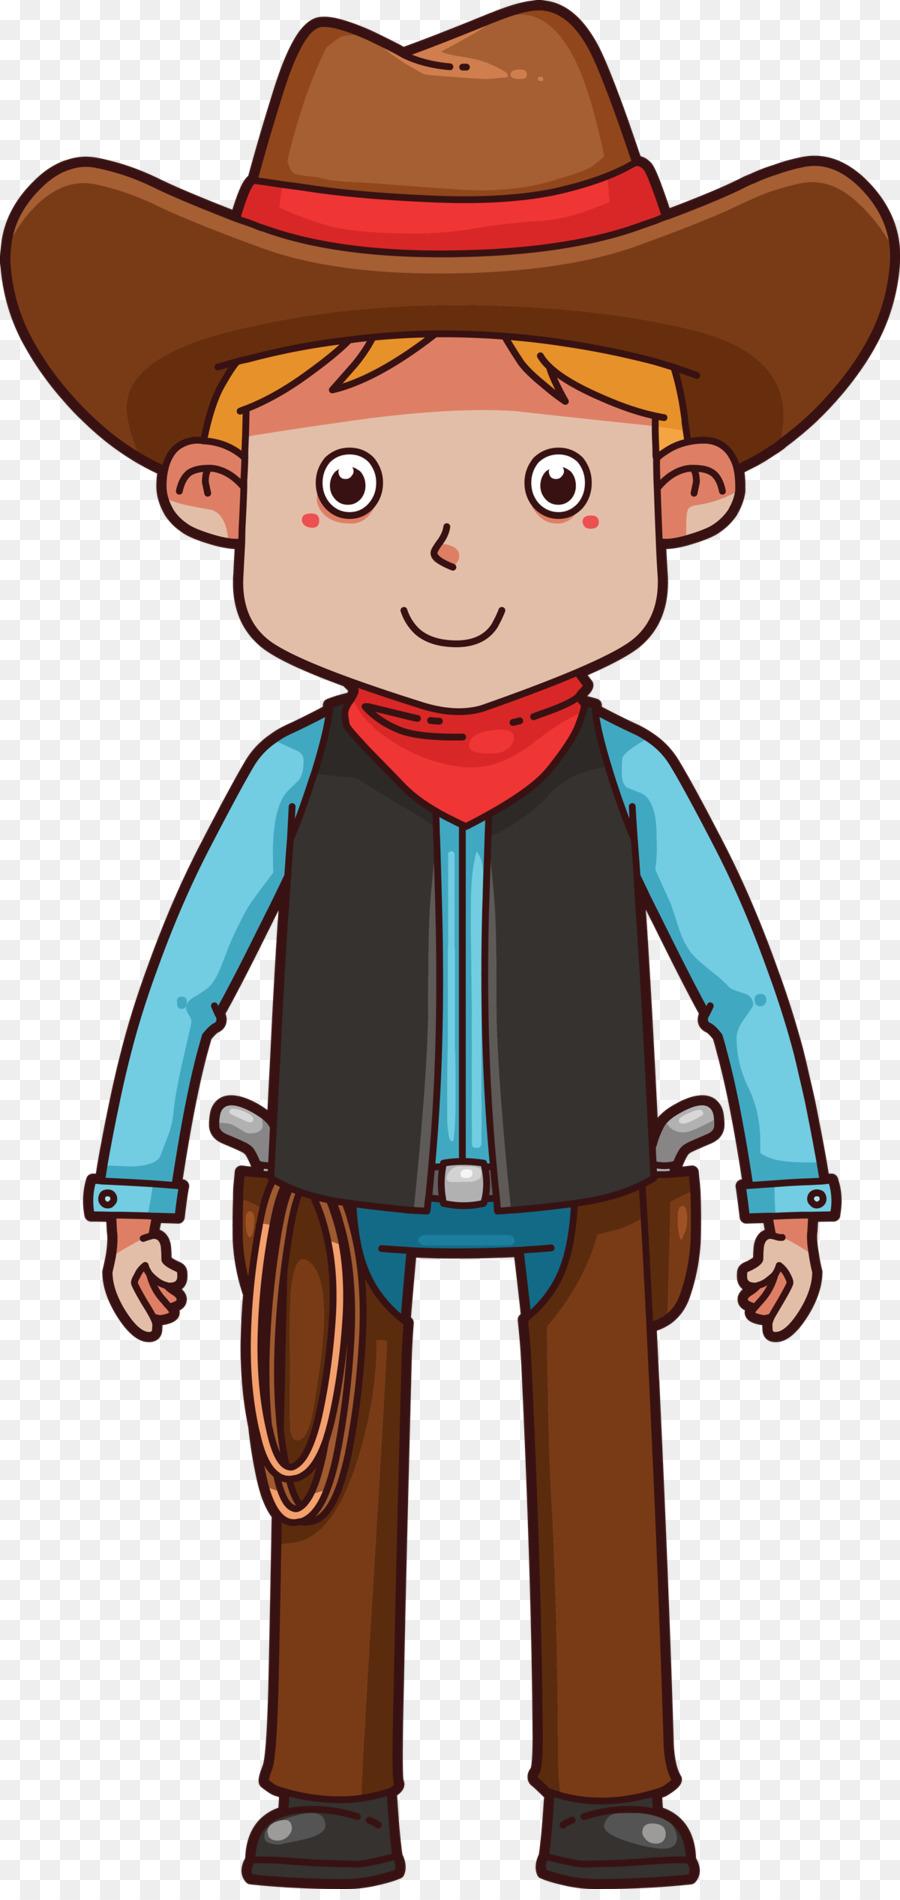 Cowboy clipart png svg download Cowboy Hat png download - 1200*2519 - Free Transparent American ... svg download